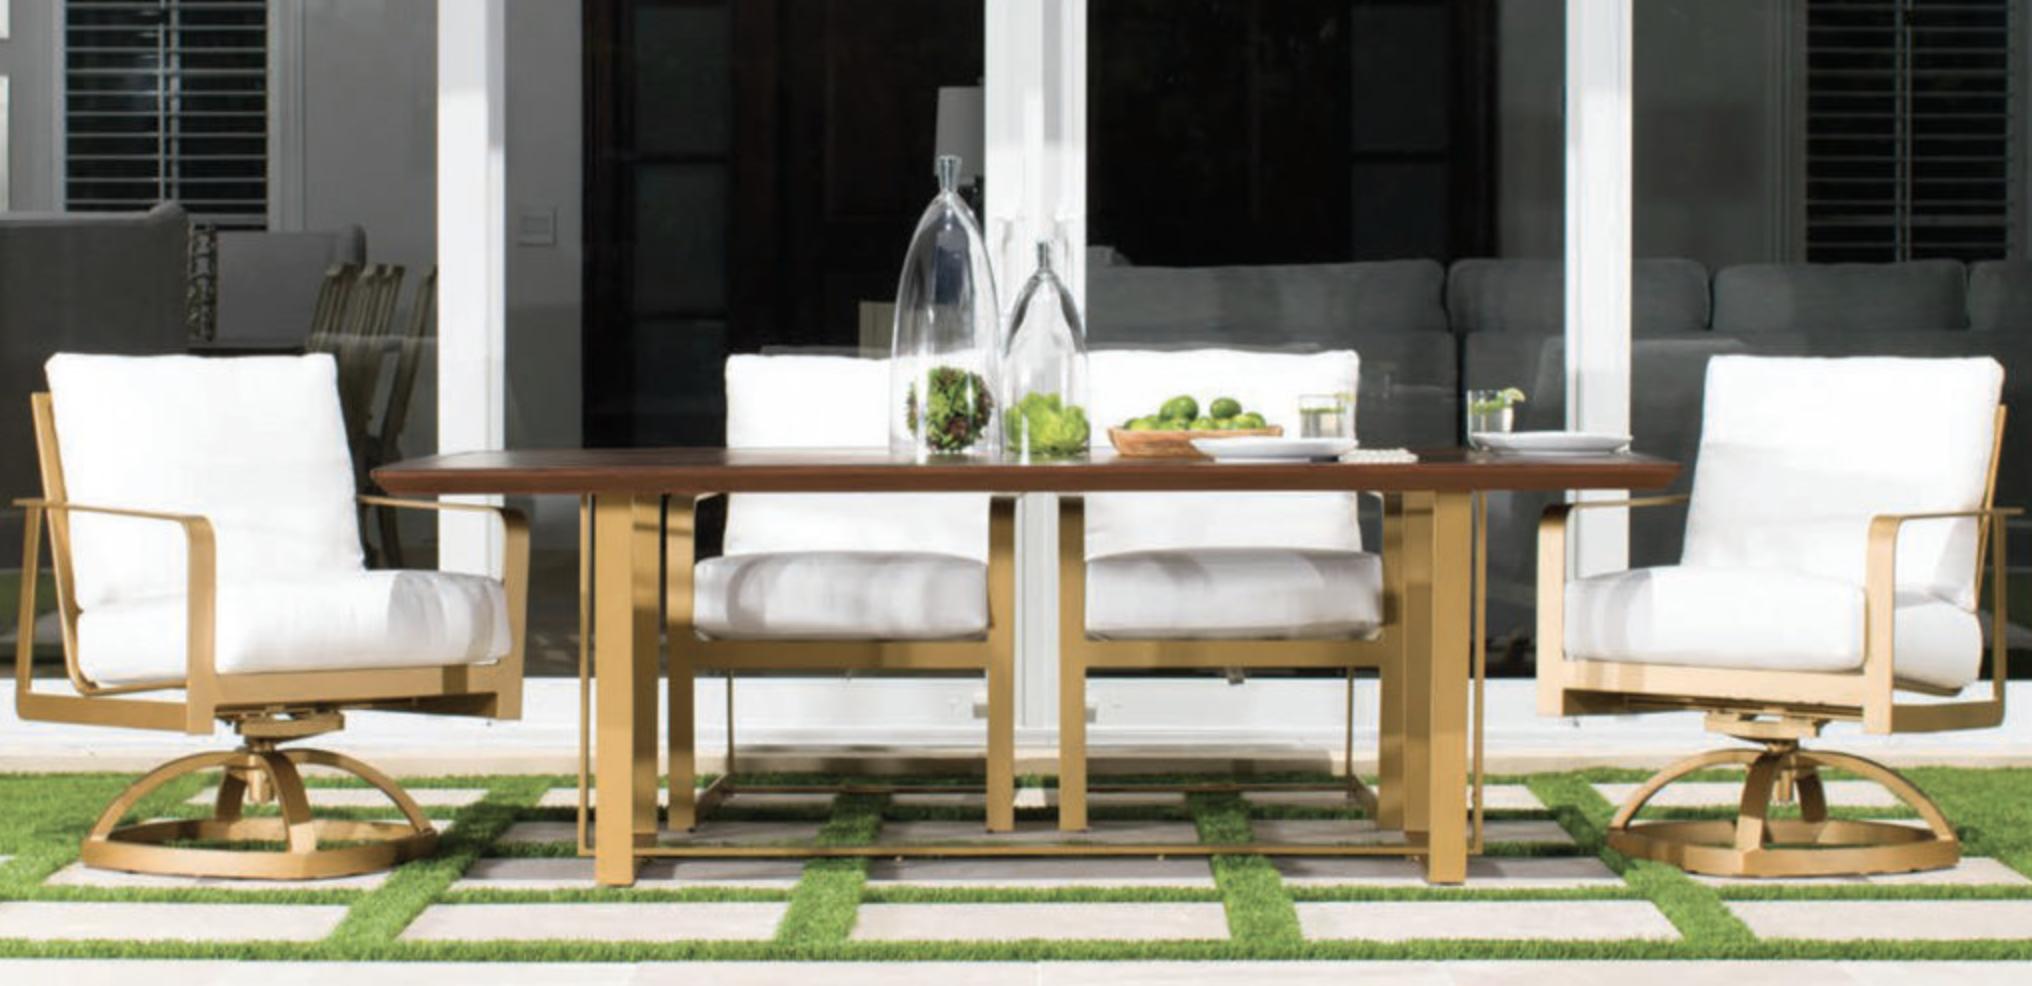 Castelle - Solaris Dining Set  Available through your designer